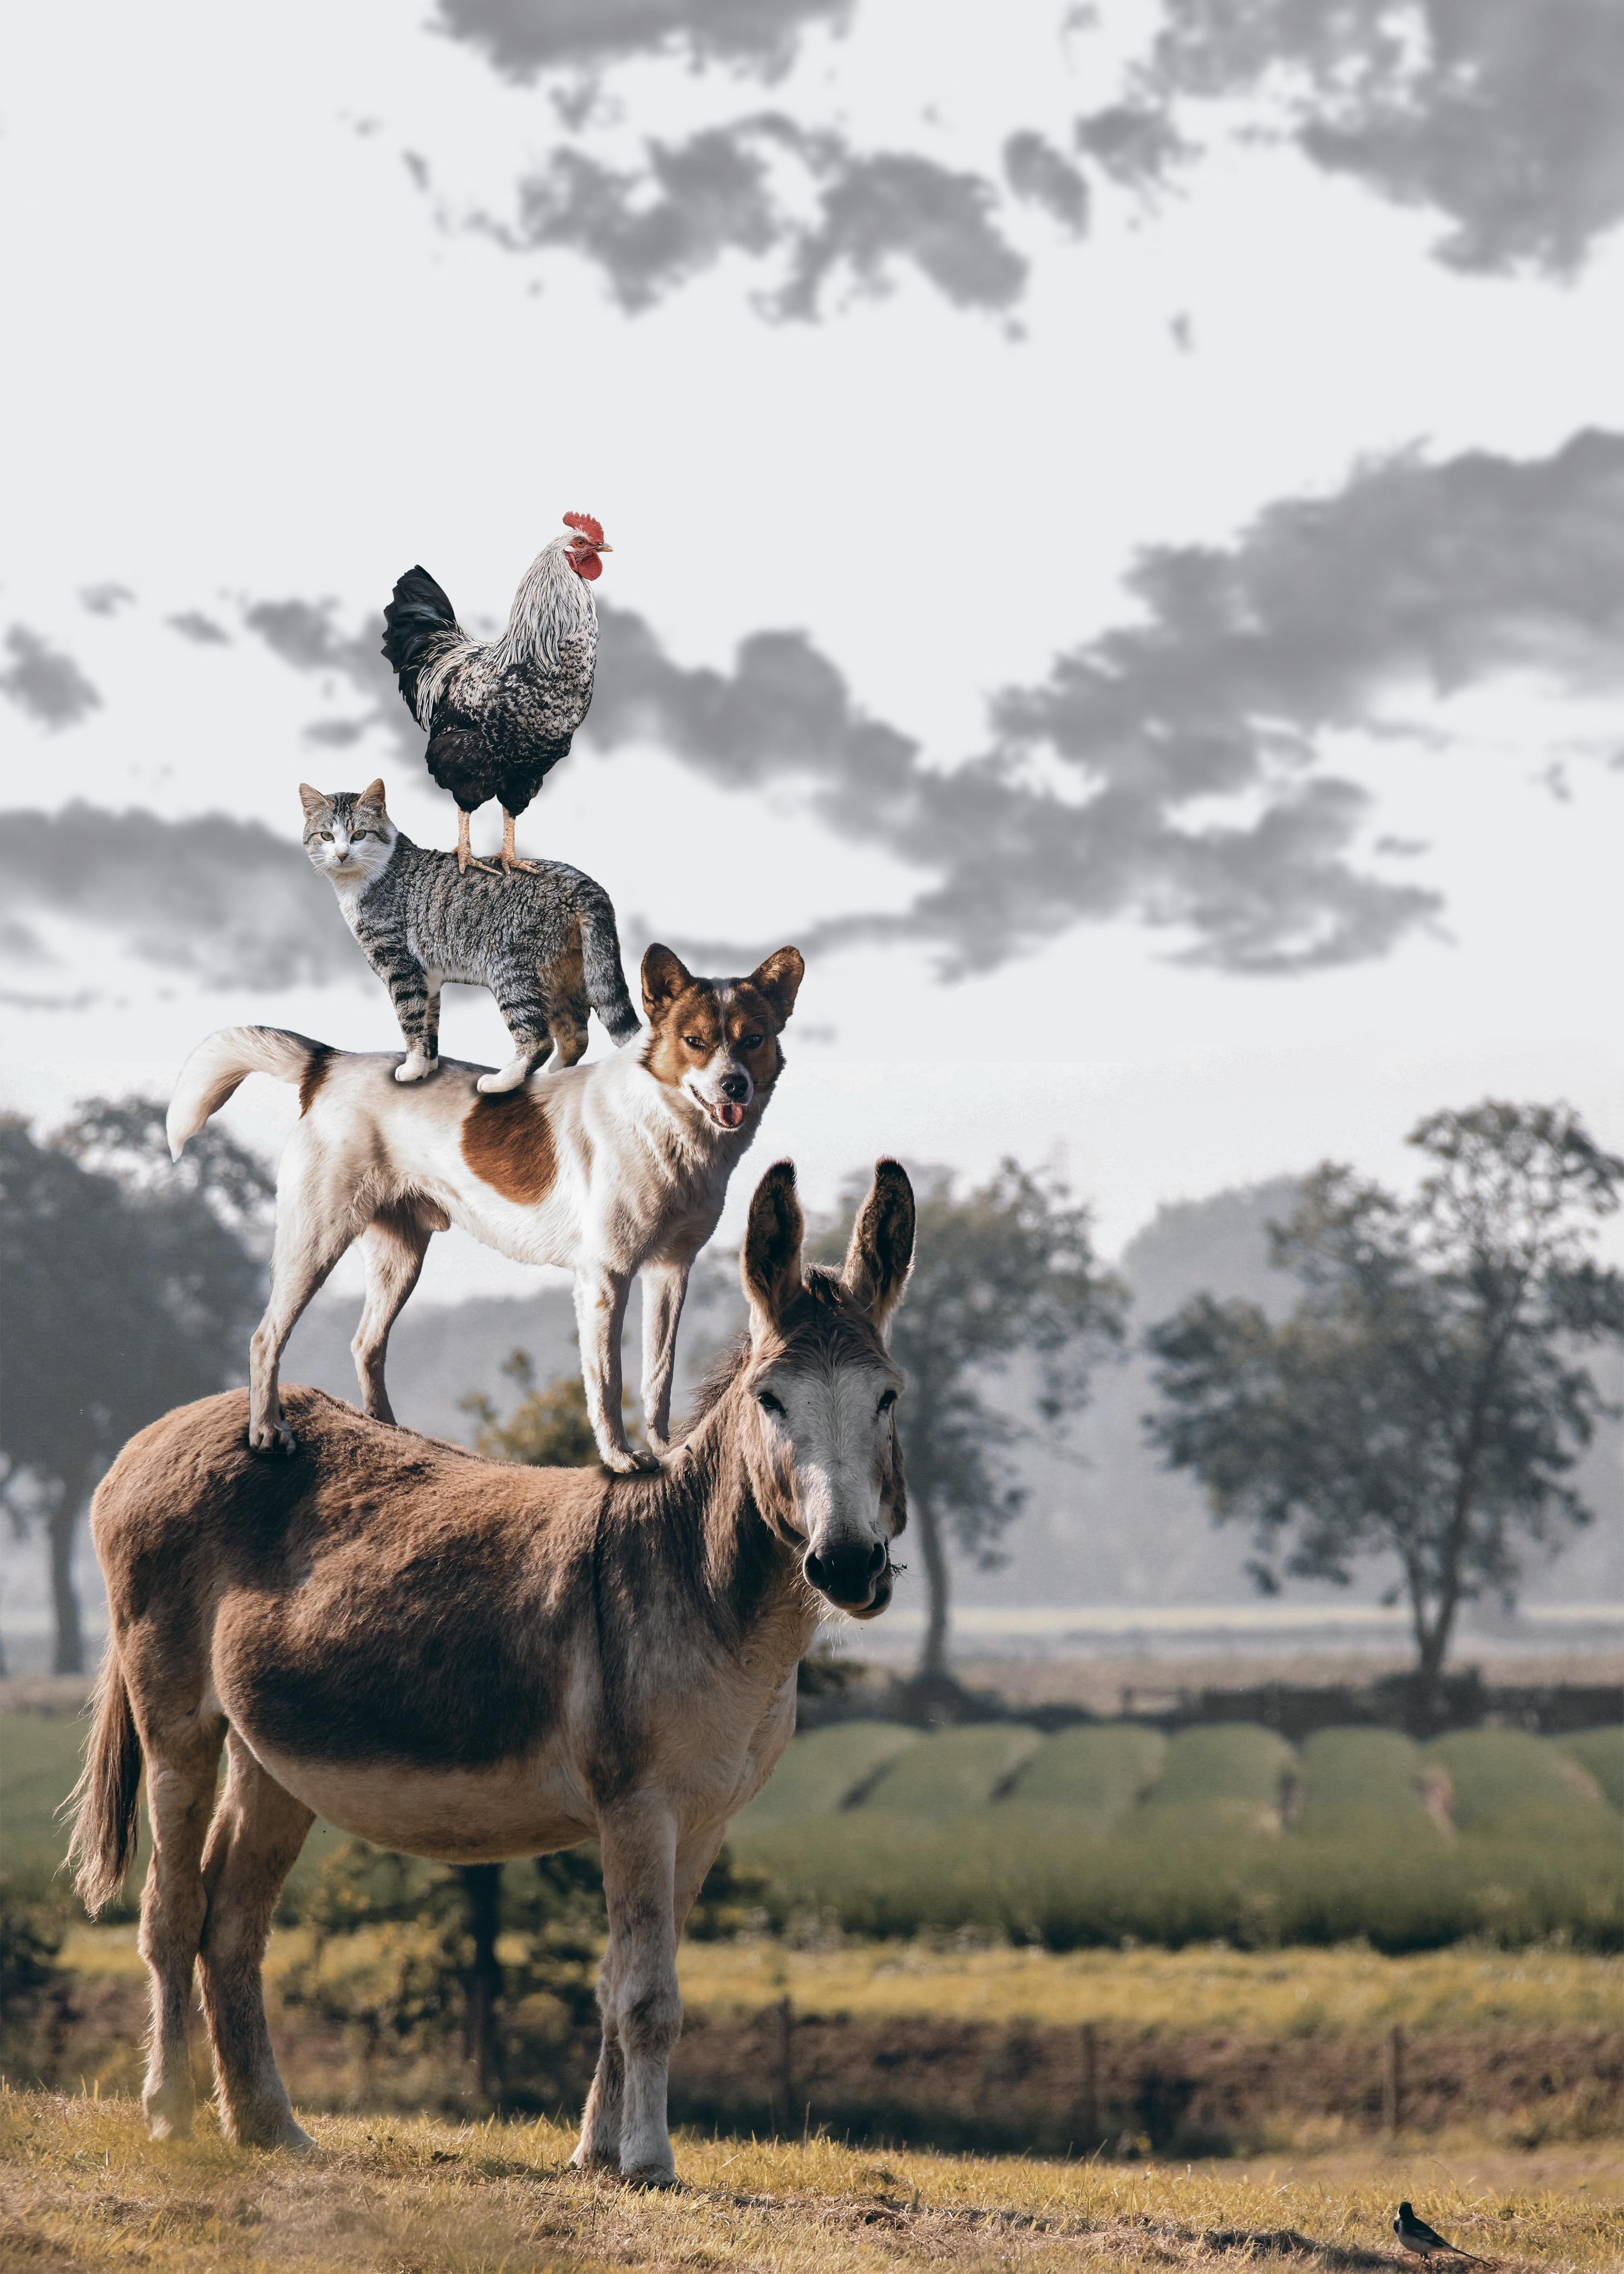 free images city dog deer cat predator donkey sage